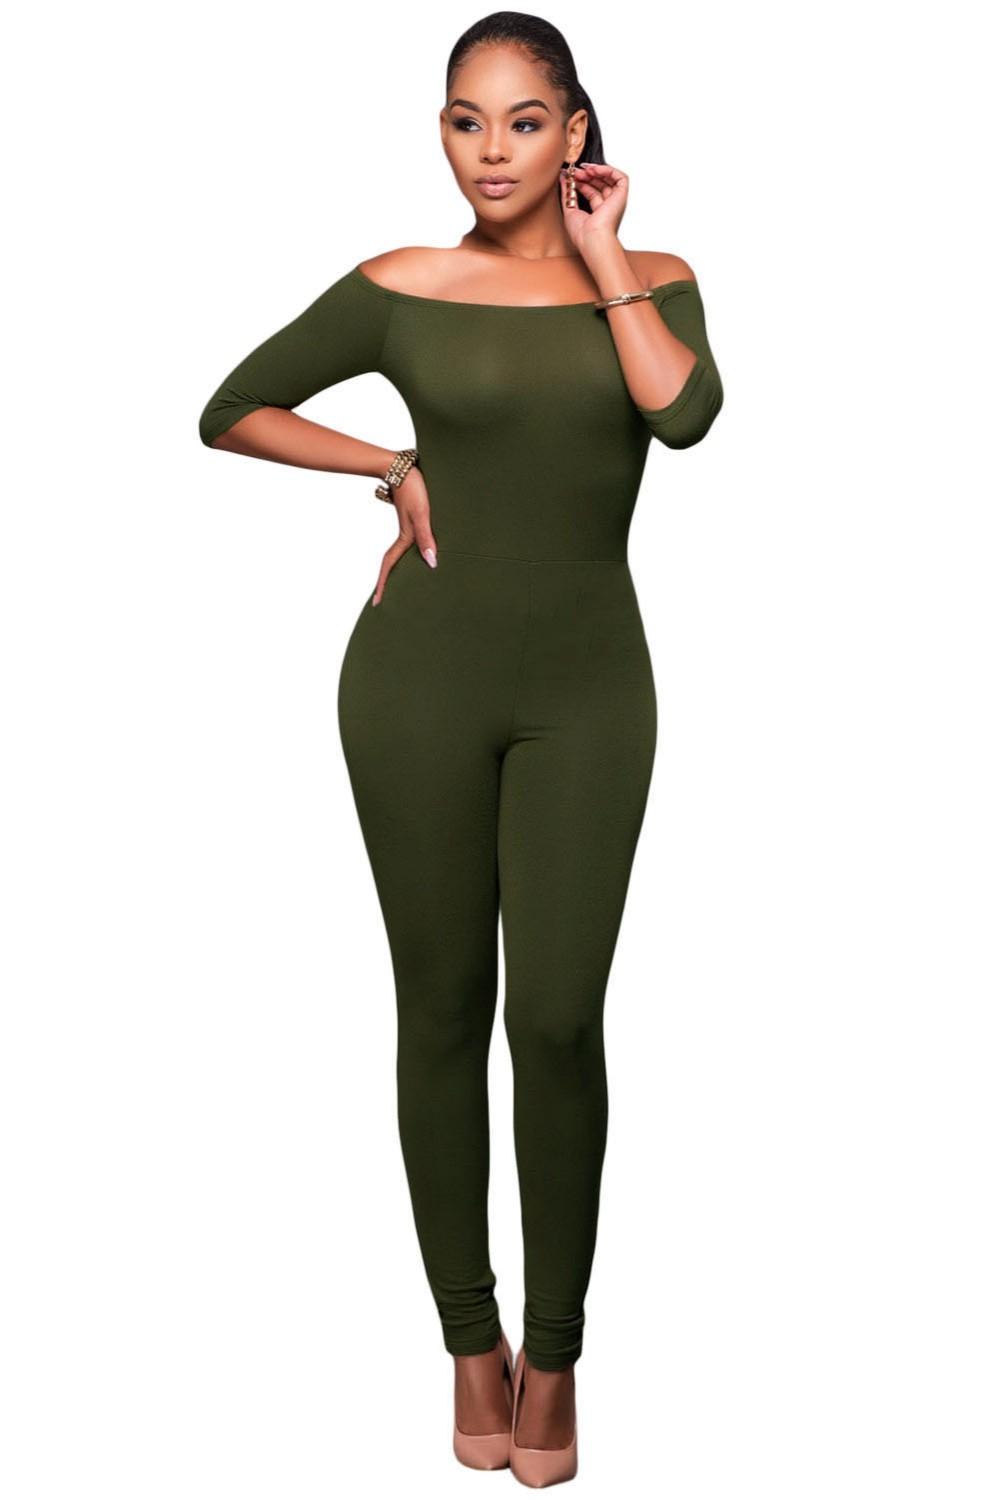 Olive-Green-Bardot-Neckline-Fashion-Jumpsuit-LC64193-9-2